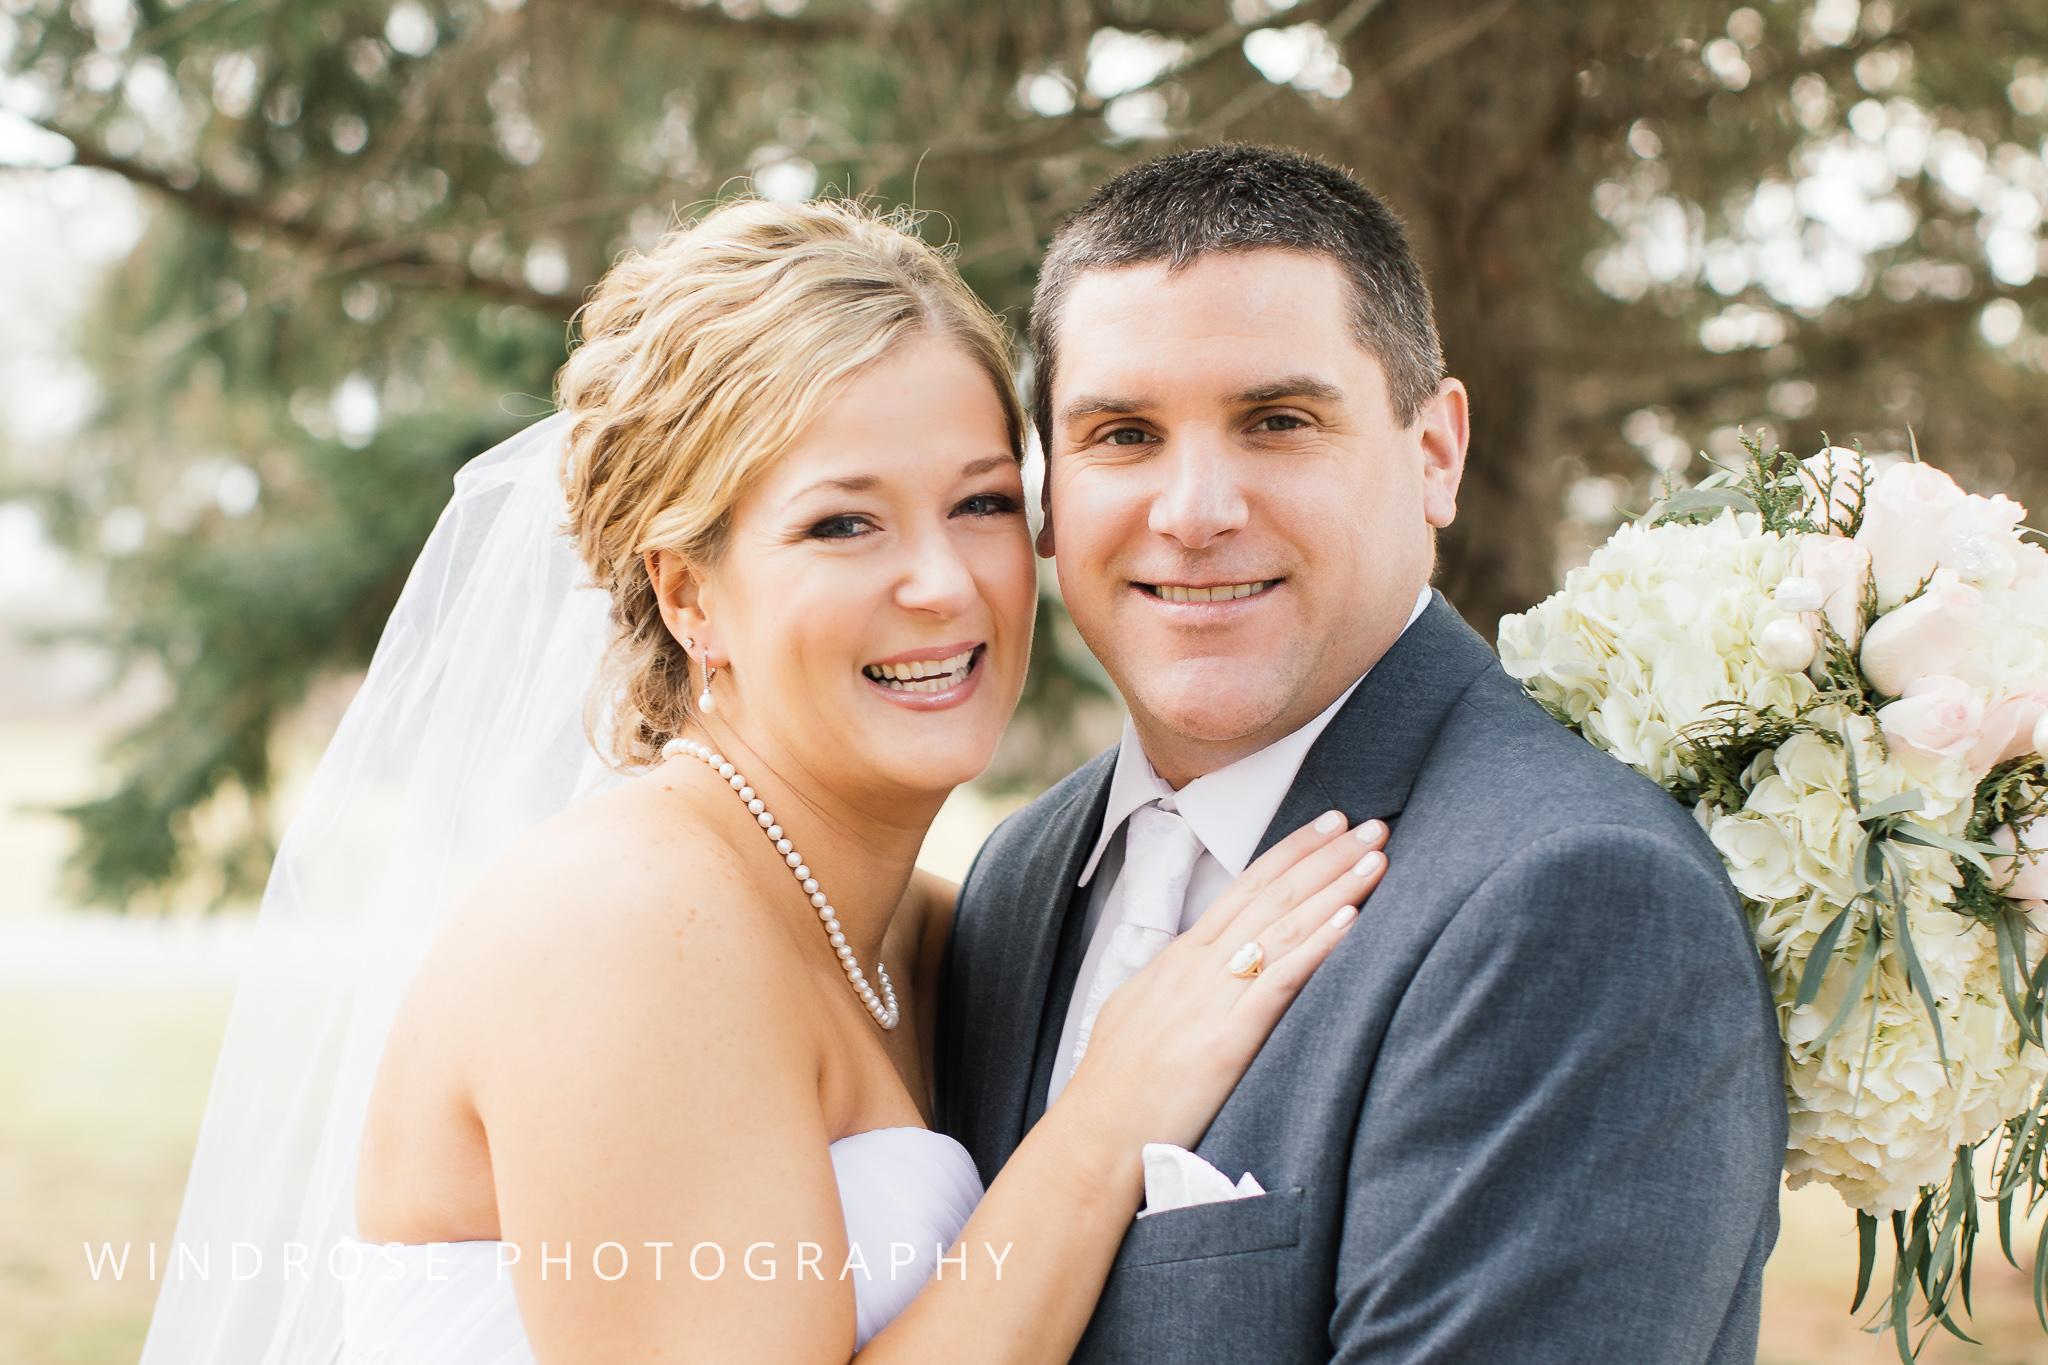 Rochester-MN-Wedding-Photo-7.jpg